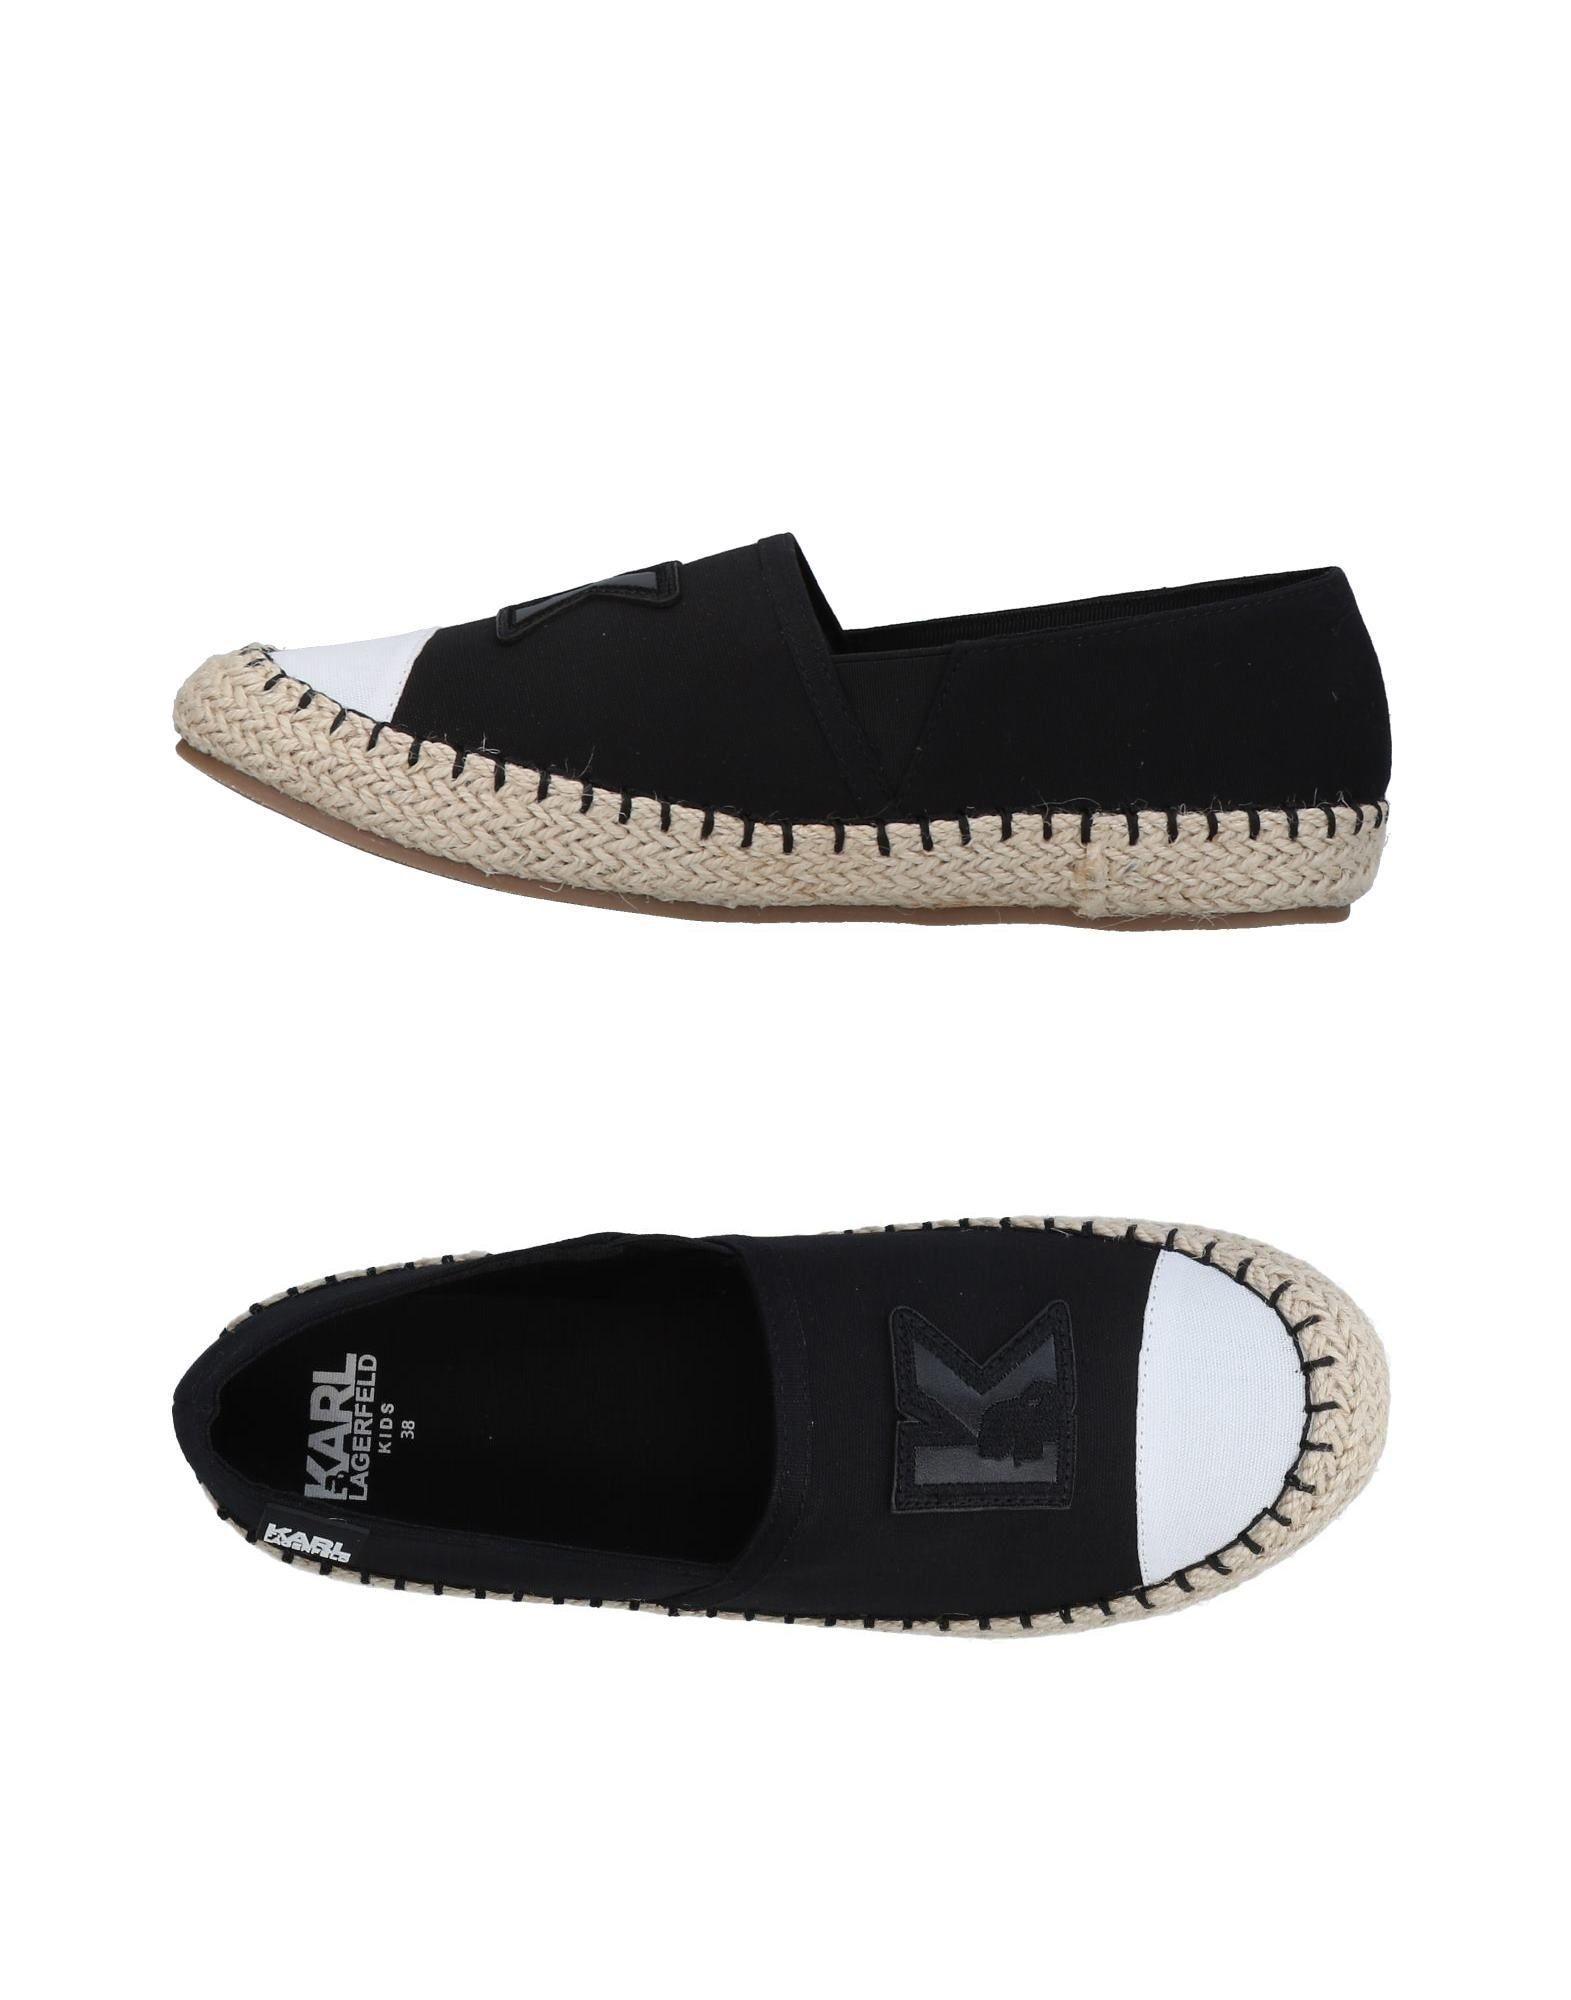 FOOTWEAR Karl Lagerfeld Black Girl Textile fibres